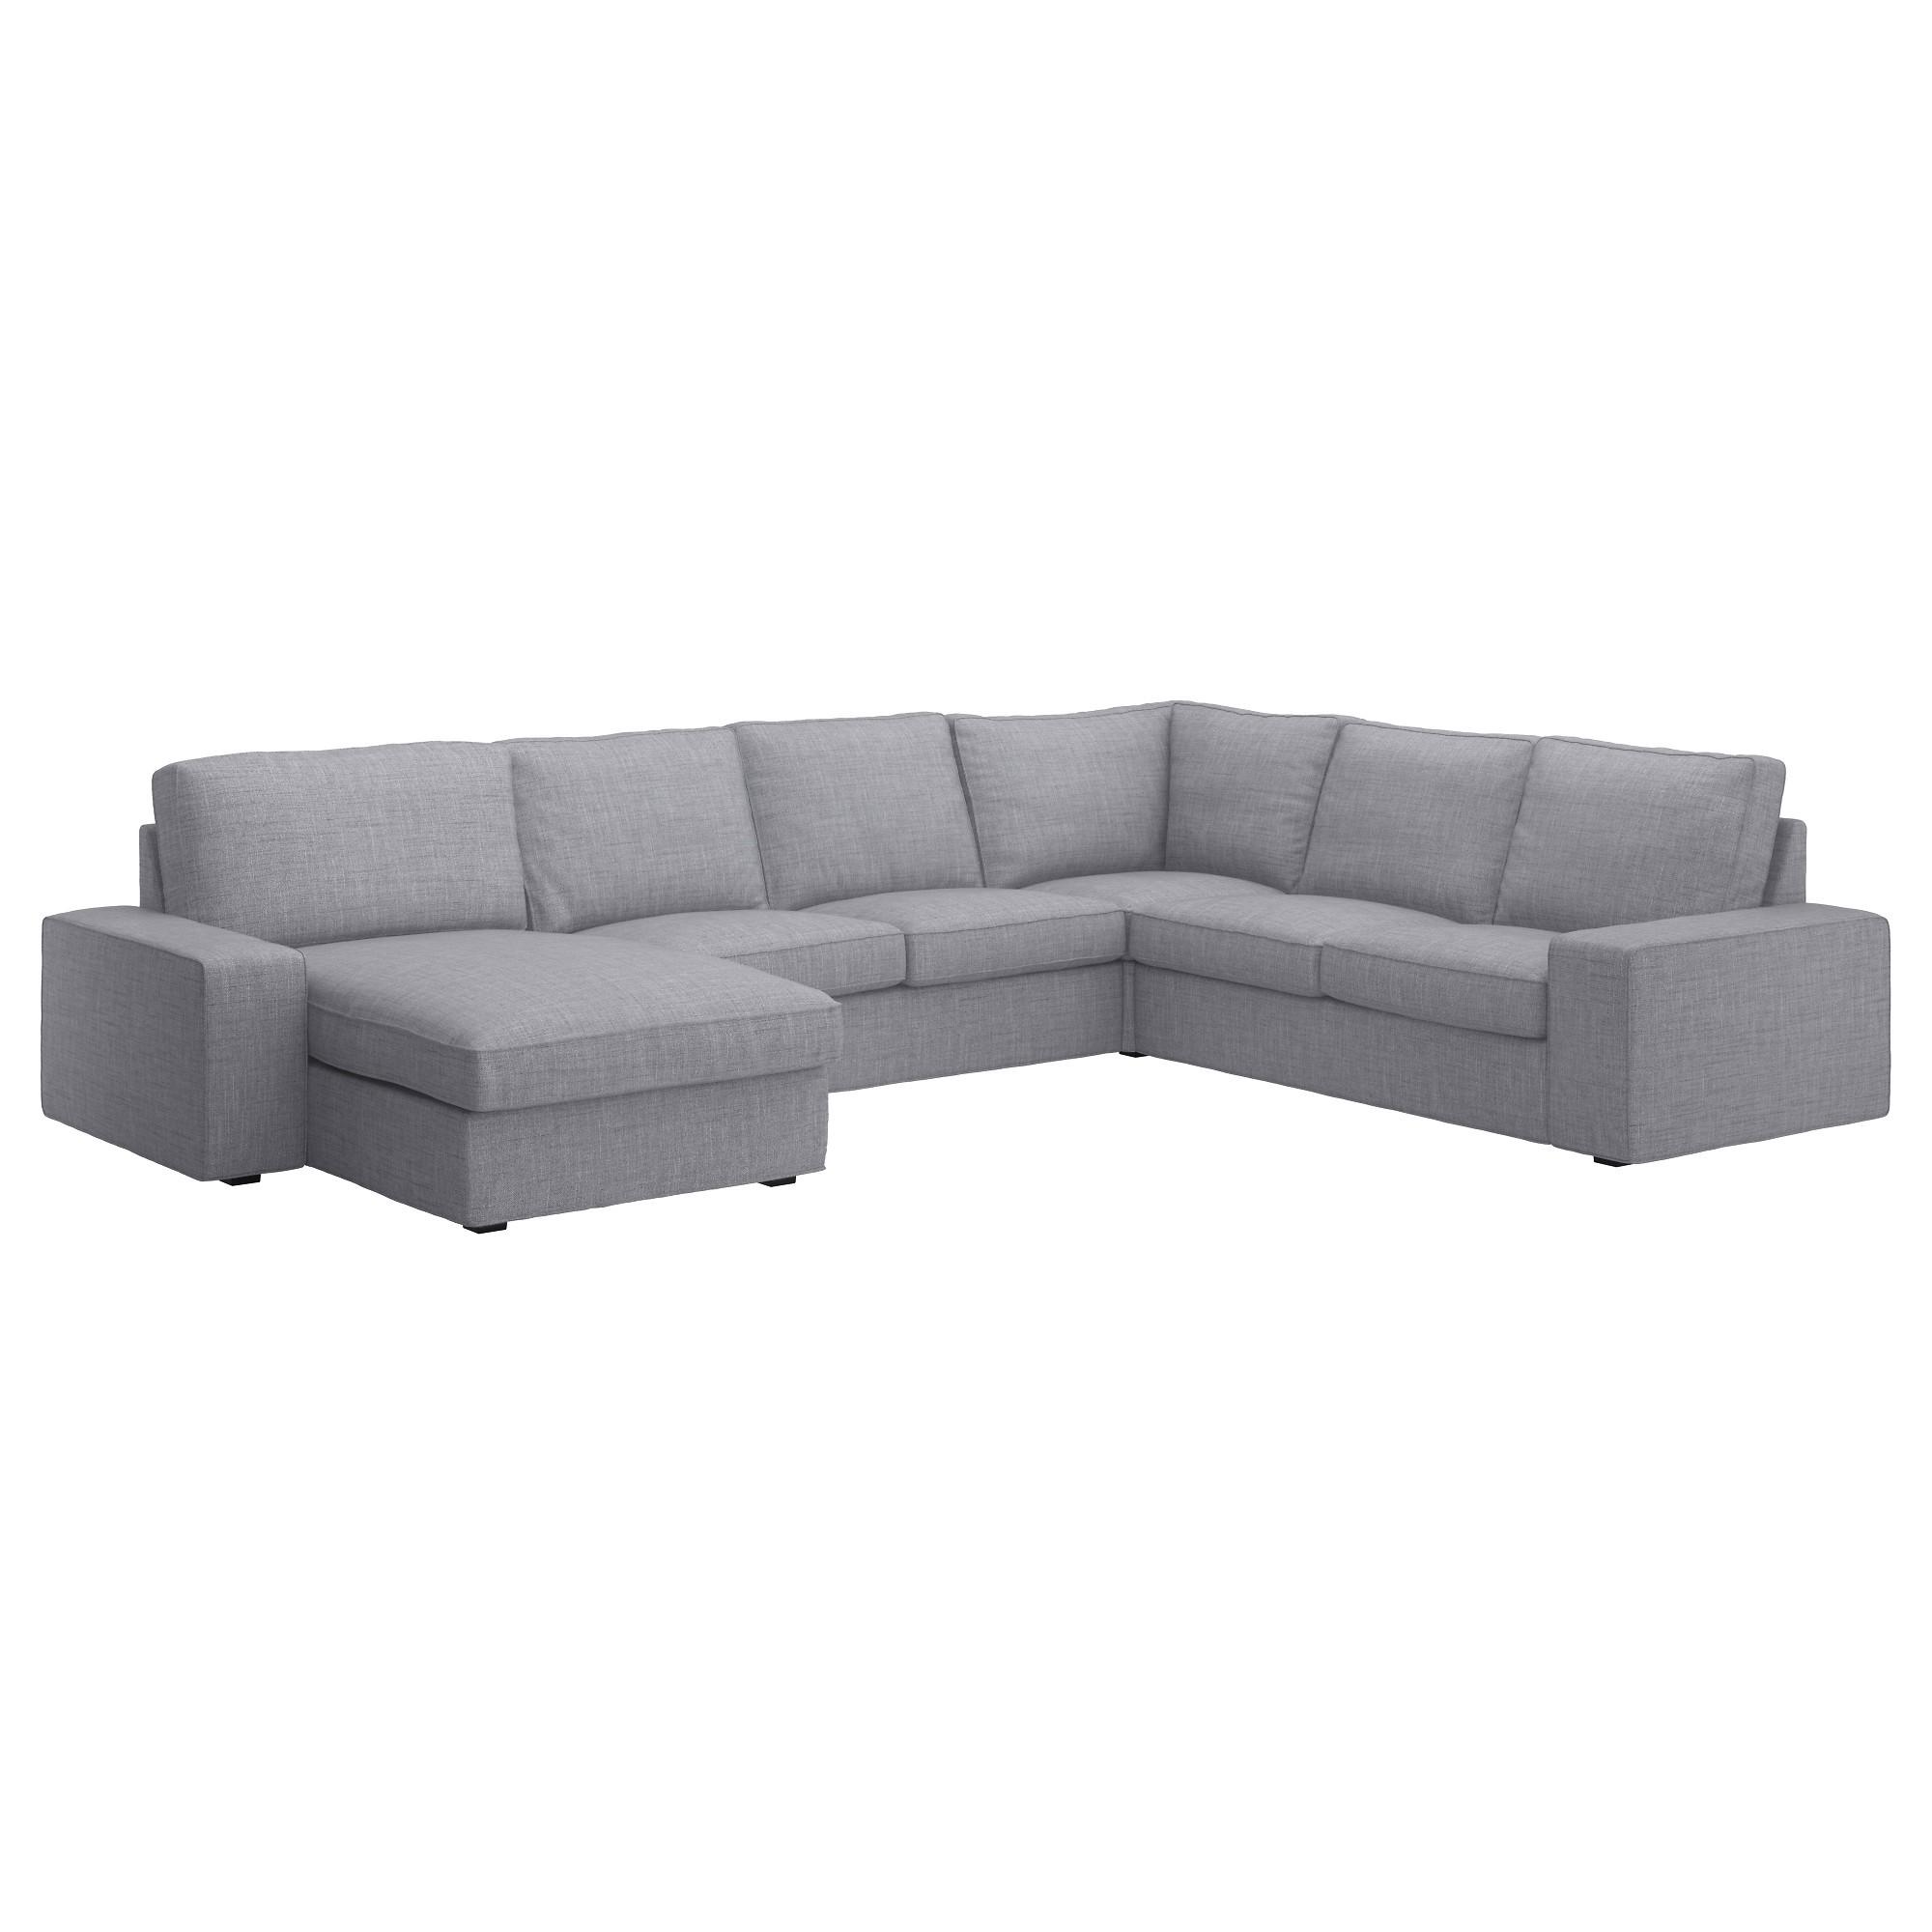 Canapé D'angle Modulable Ikea